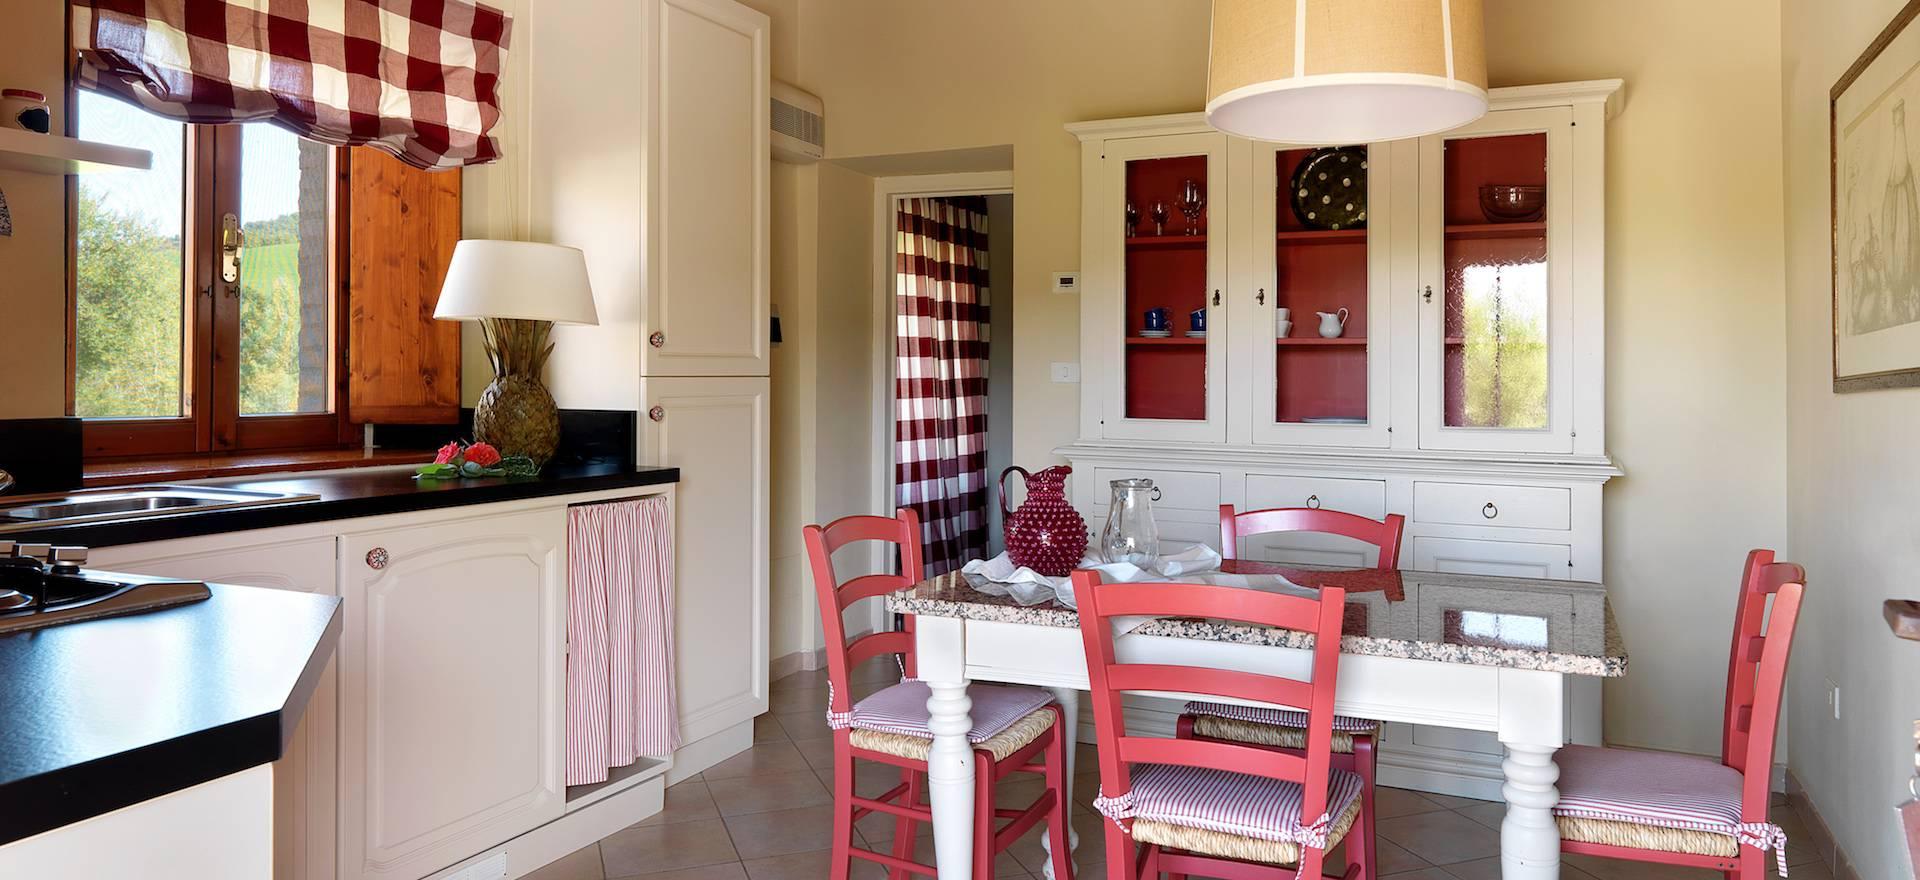 agriturismo toscana con appartamenti ben arredati